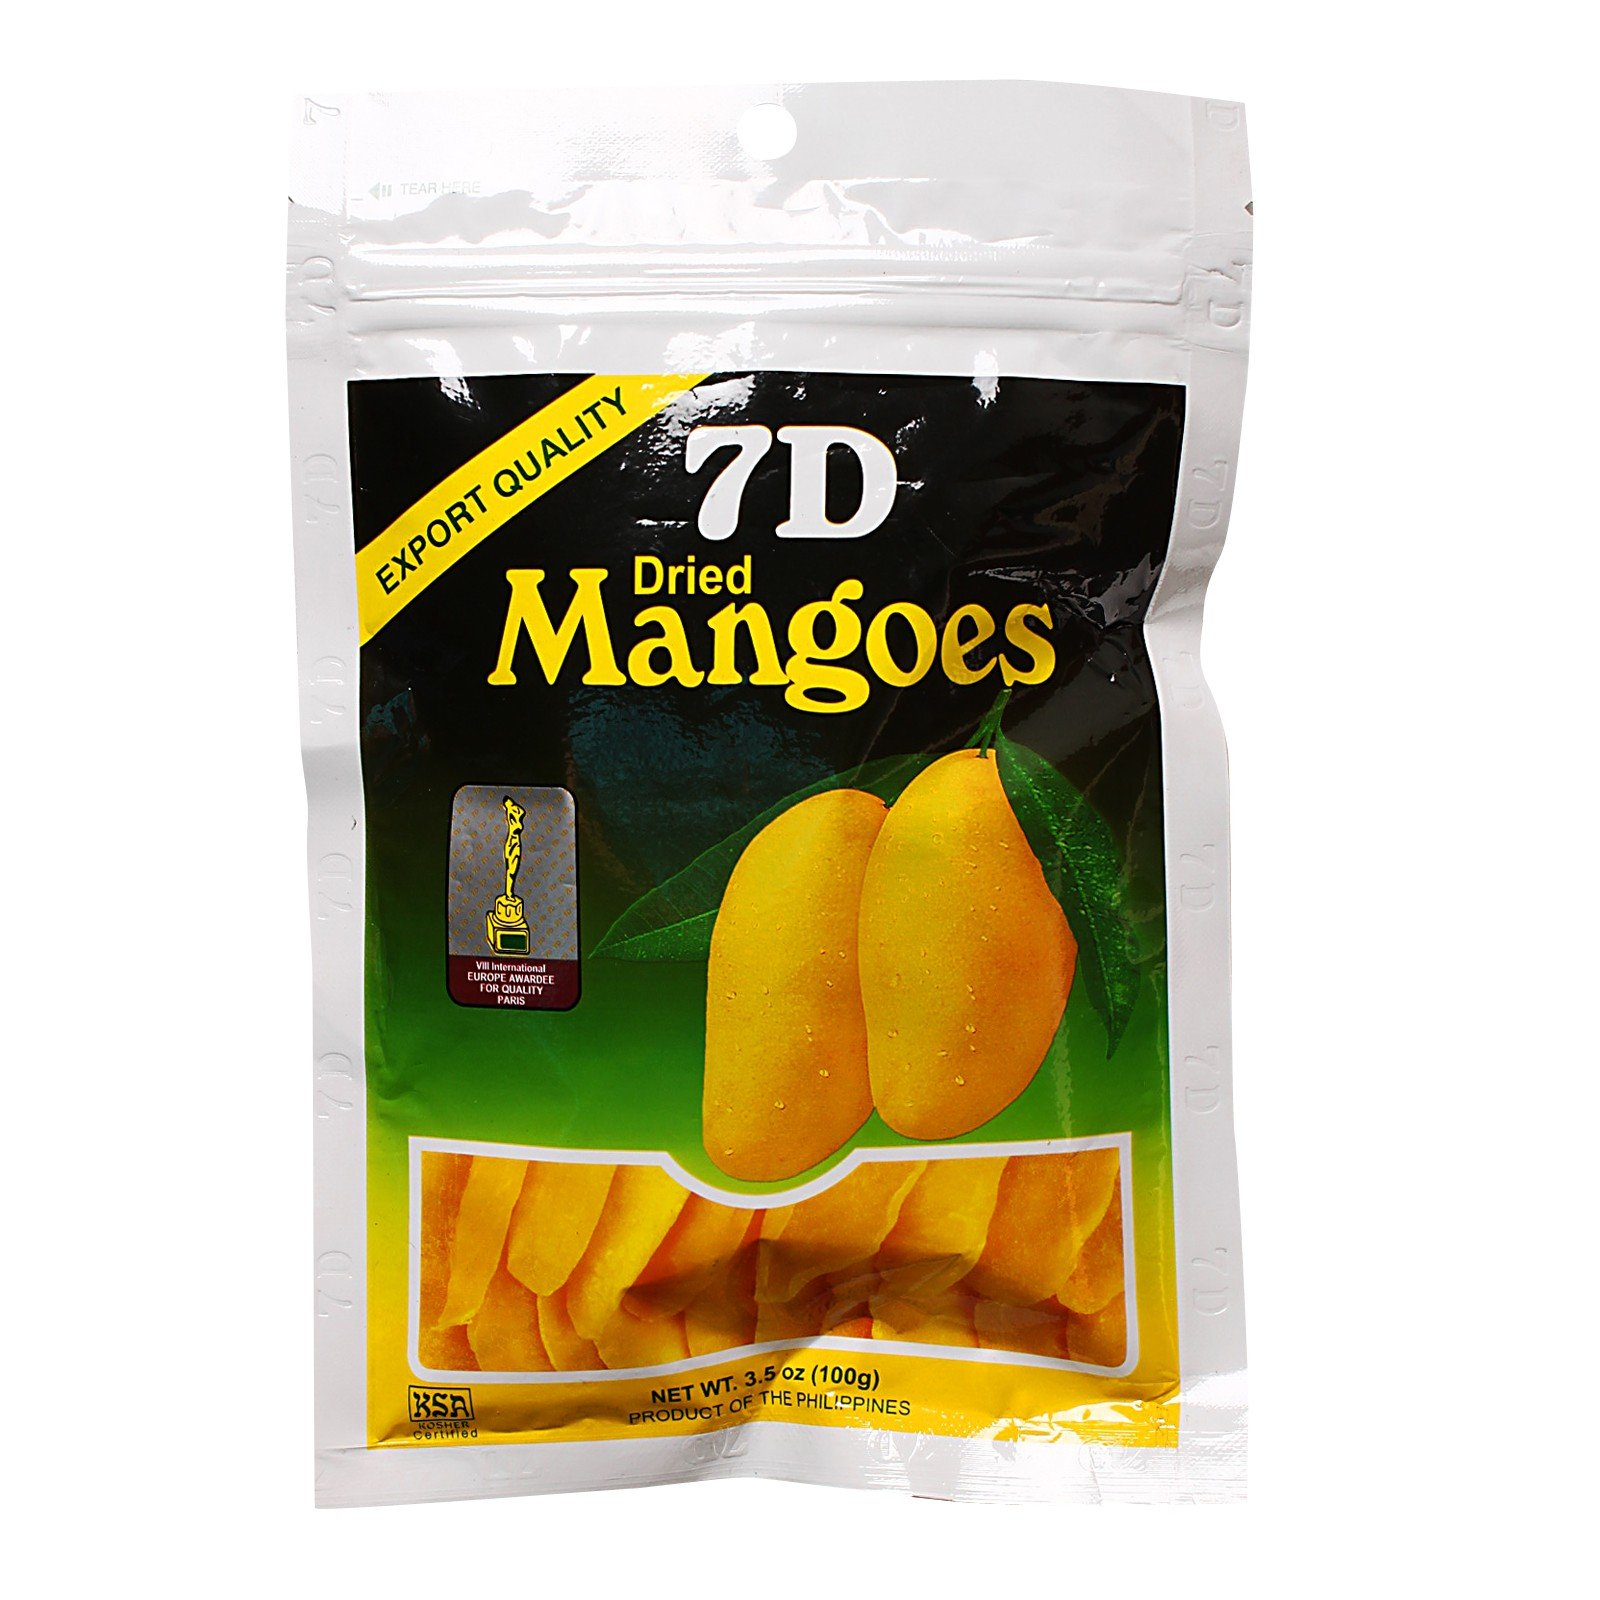 Image result for 7d mango